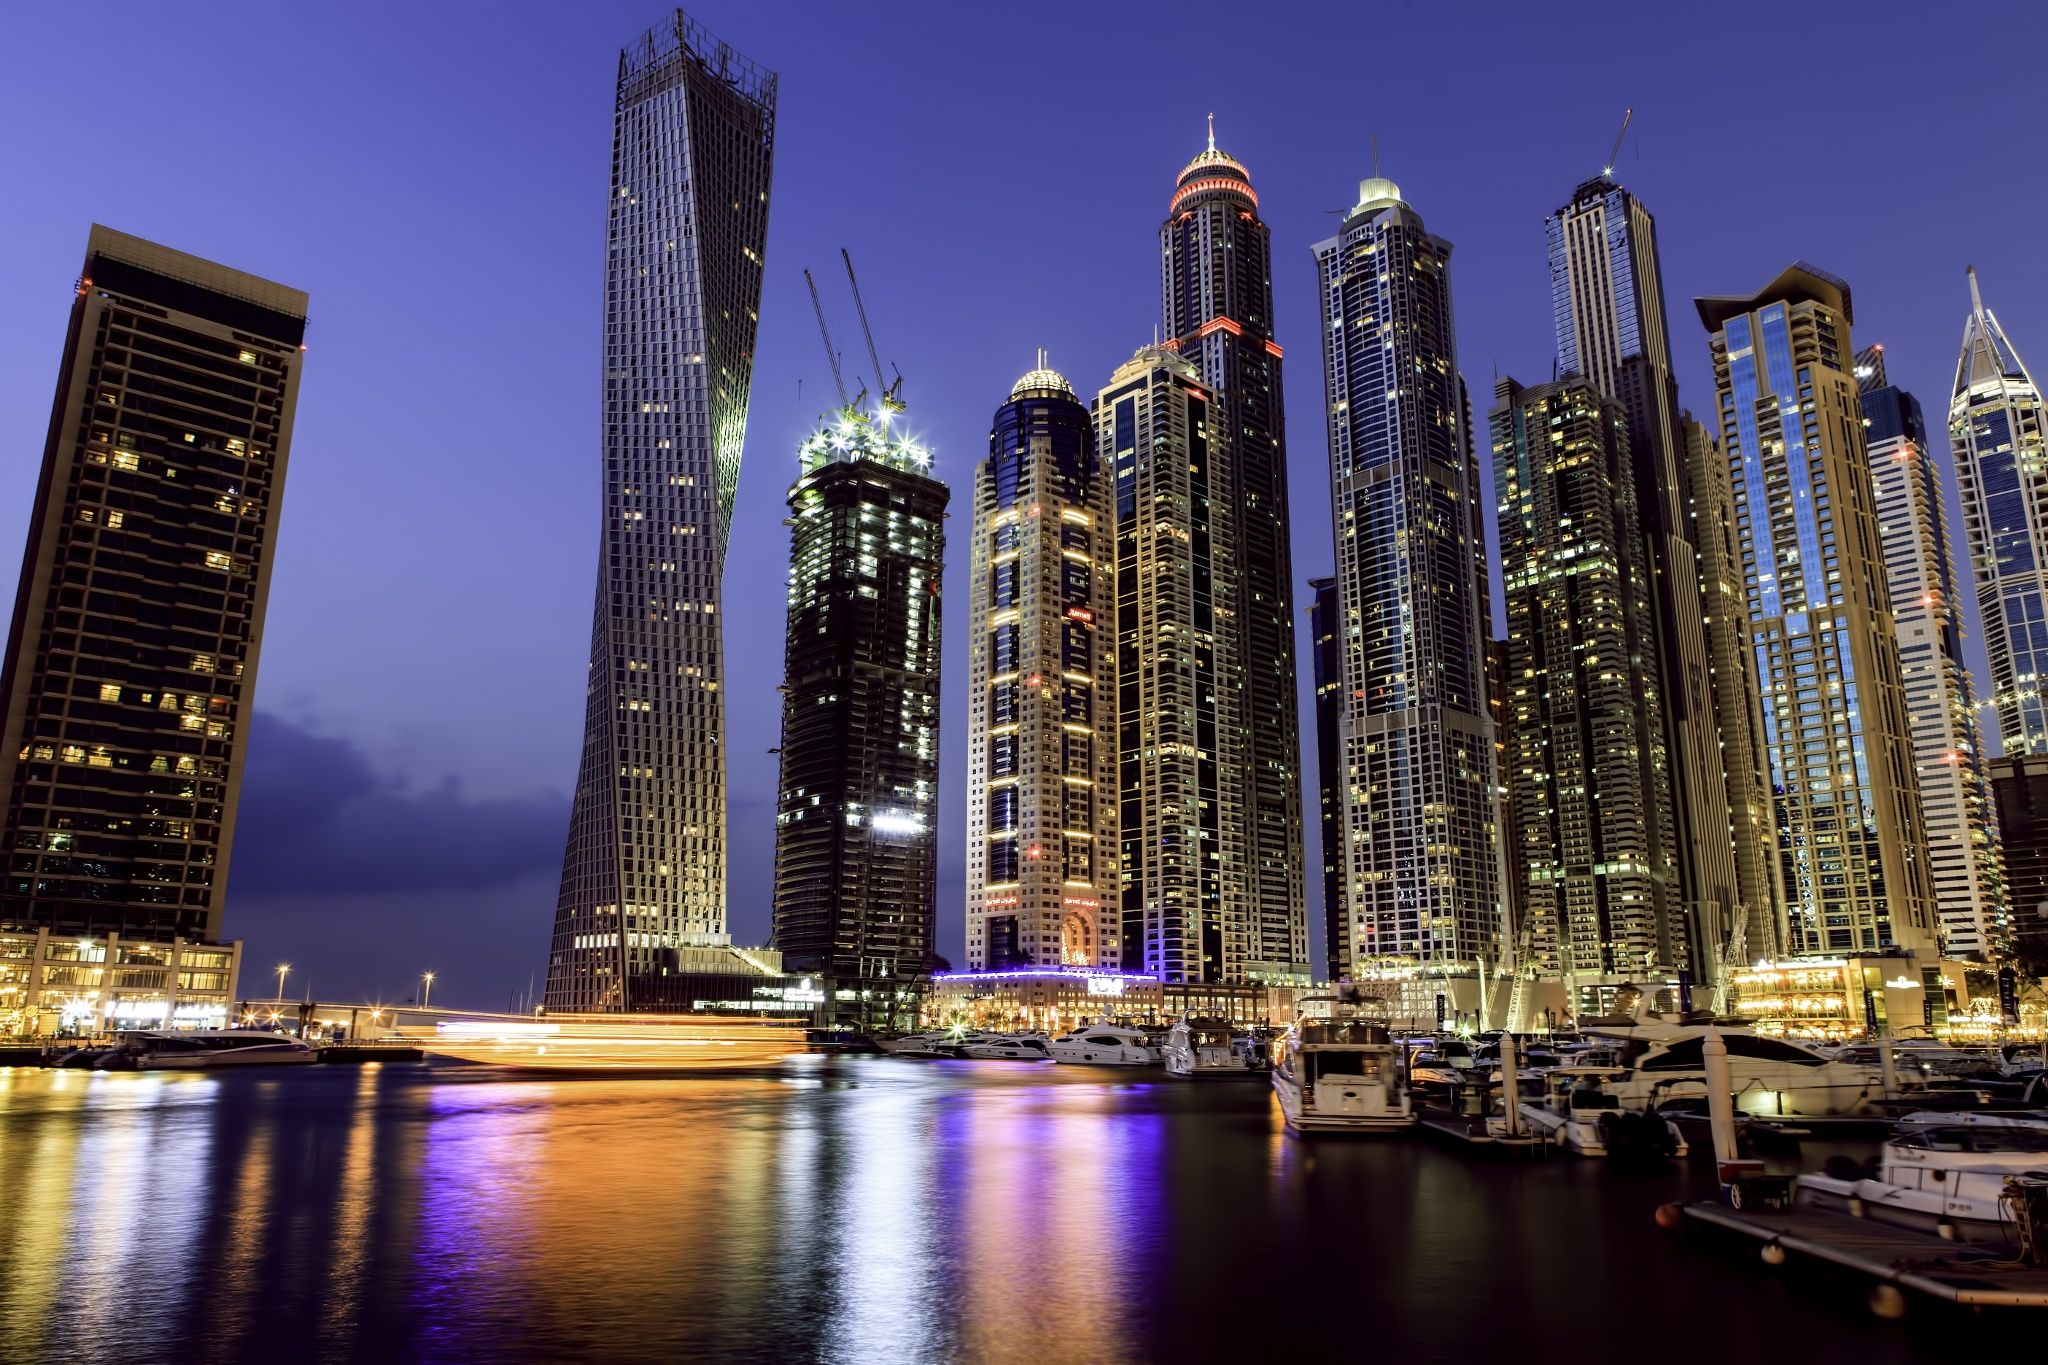 Cayan Twist Tower Dubai by Mubarak Fahad on 500px | Photos | Pinterest